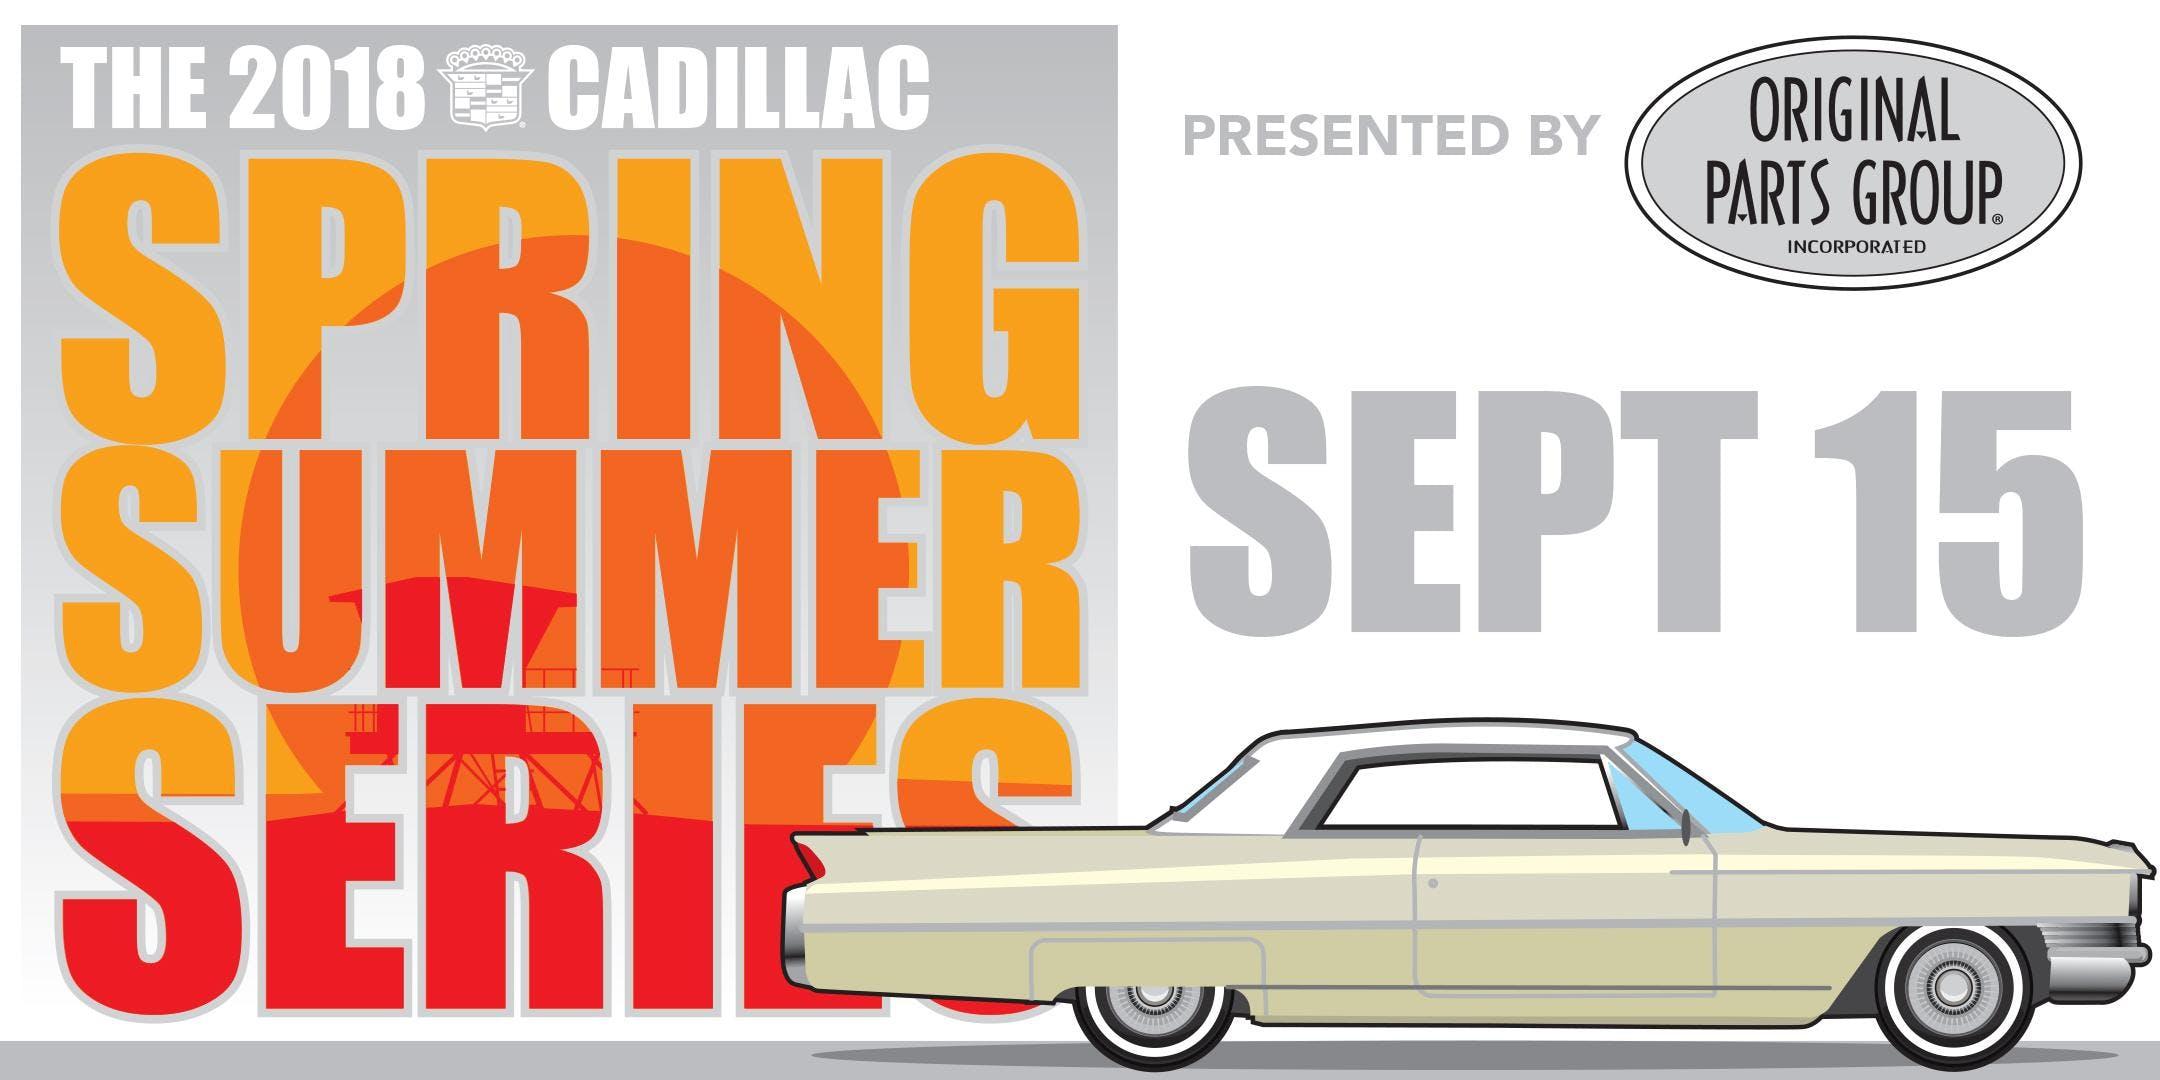 CADILLAC Car Show Car Registration SEP - Orange beach car show 2018